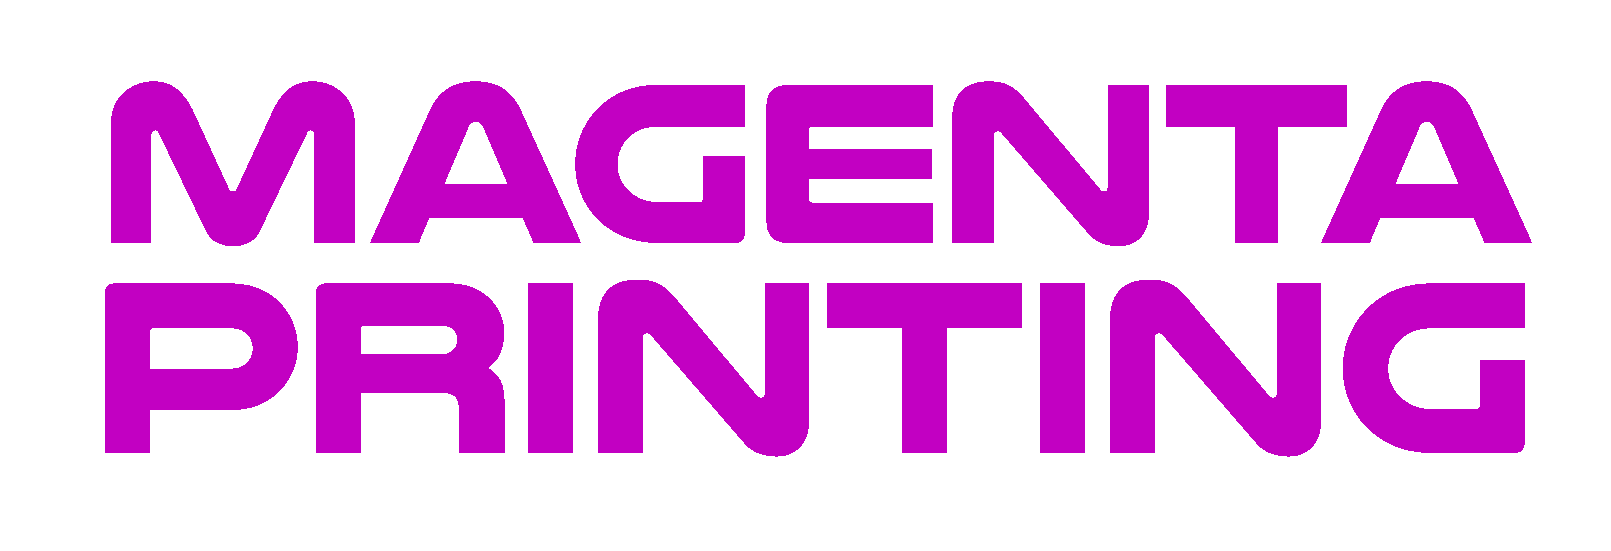 Magenta Printing Franklin WI banner